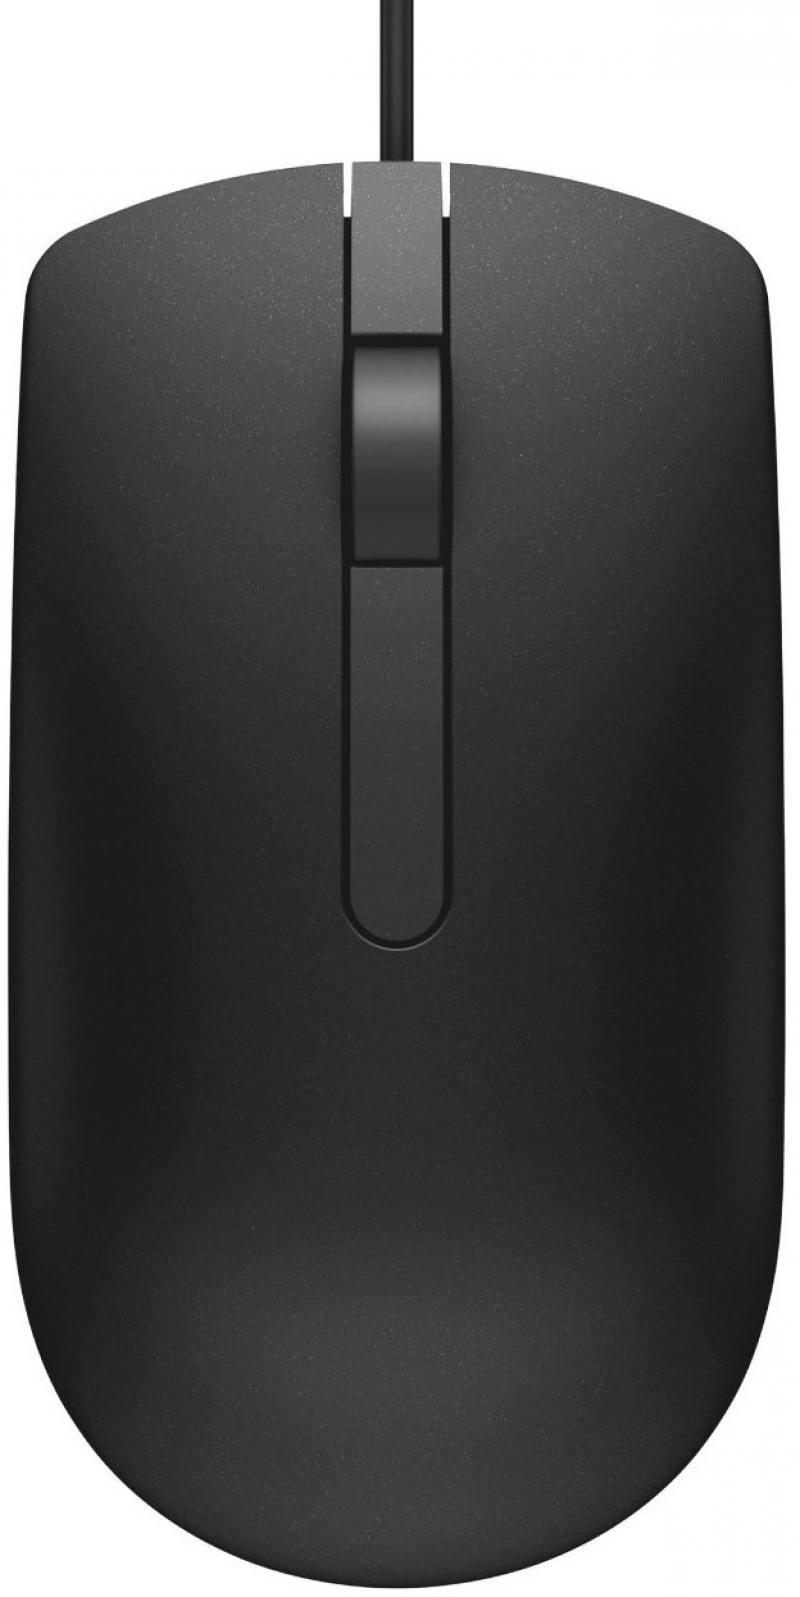 Мышь проводная DELL MS116p чёрный USB 570-AAIQ мышь dell wm326 570 aami 570 aami